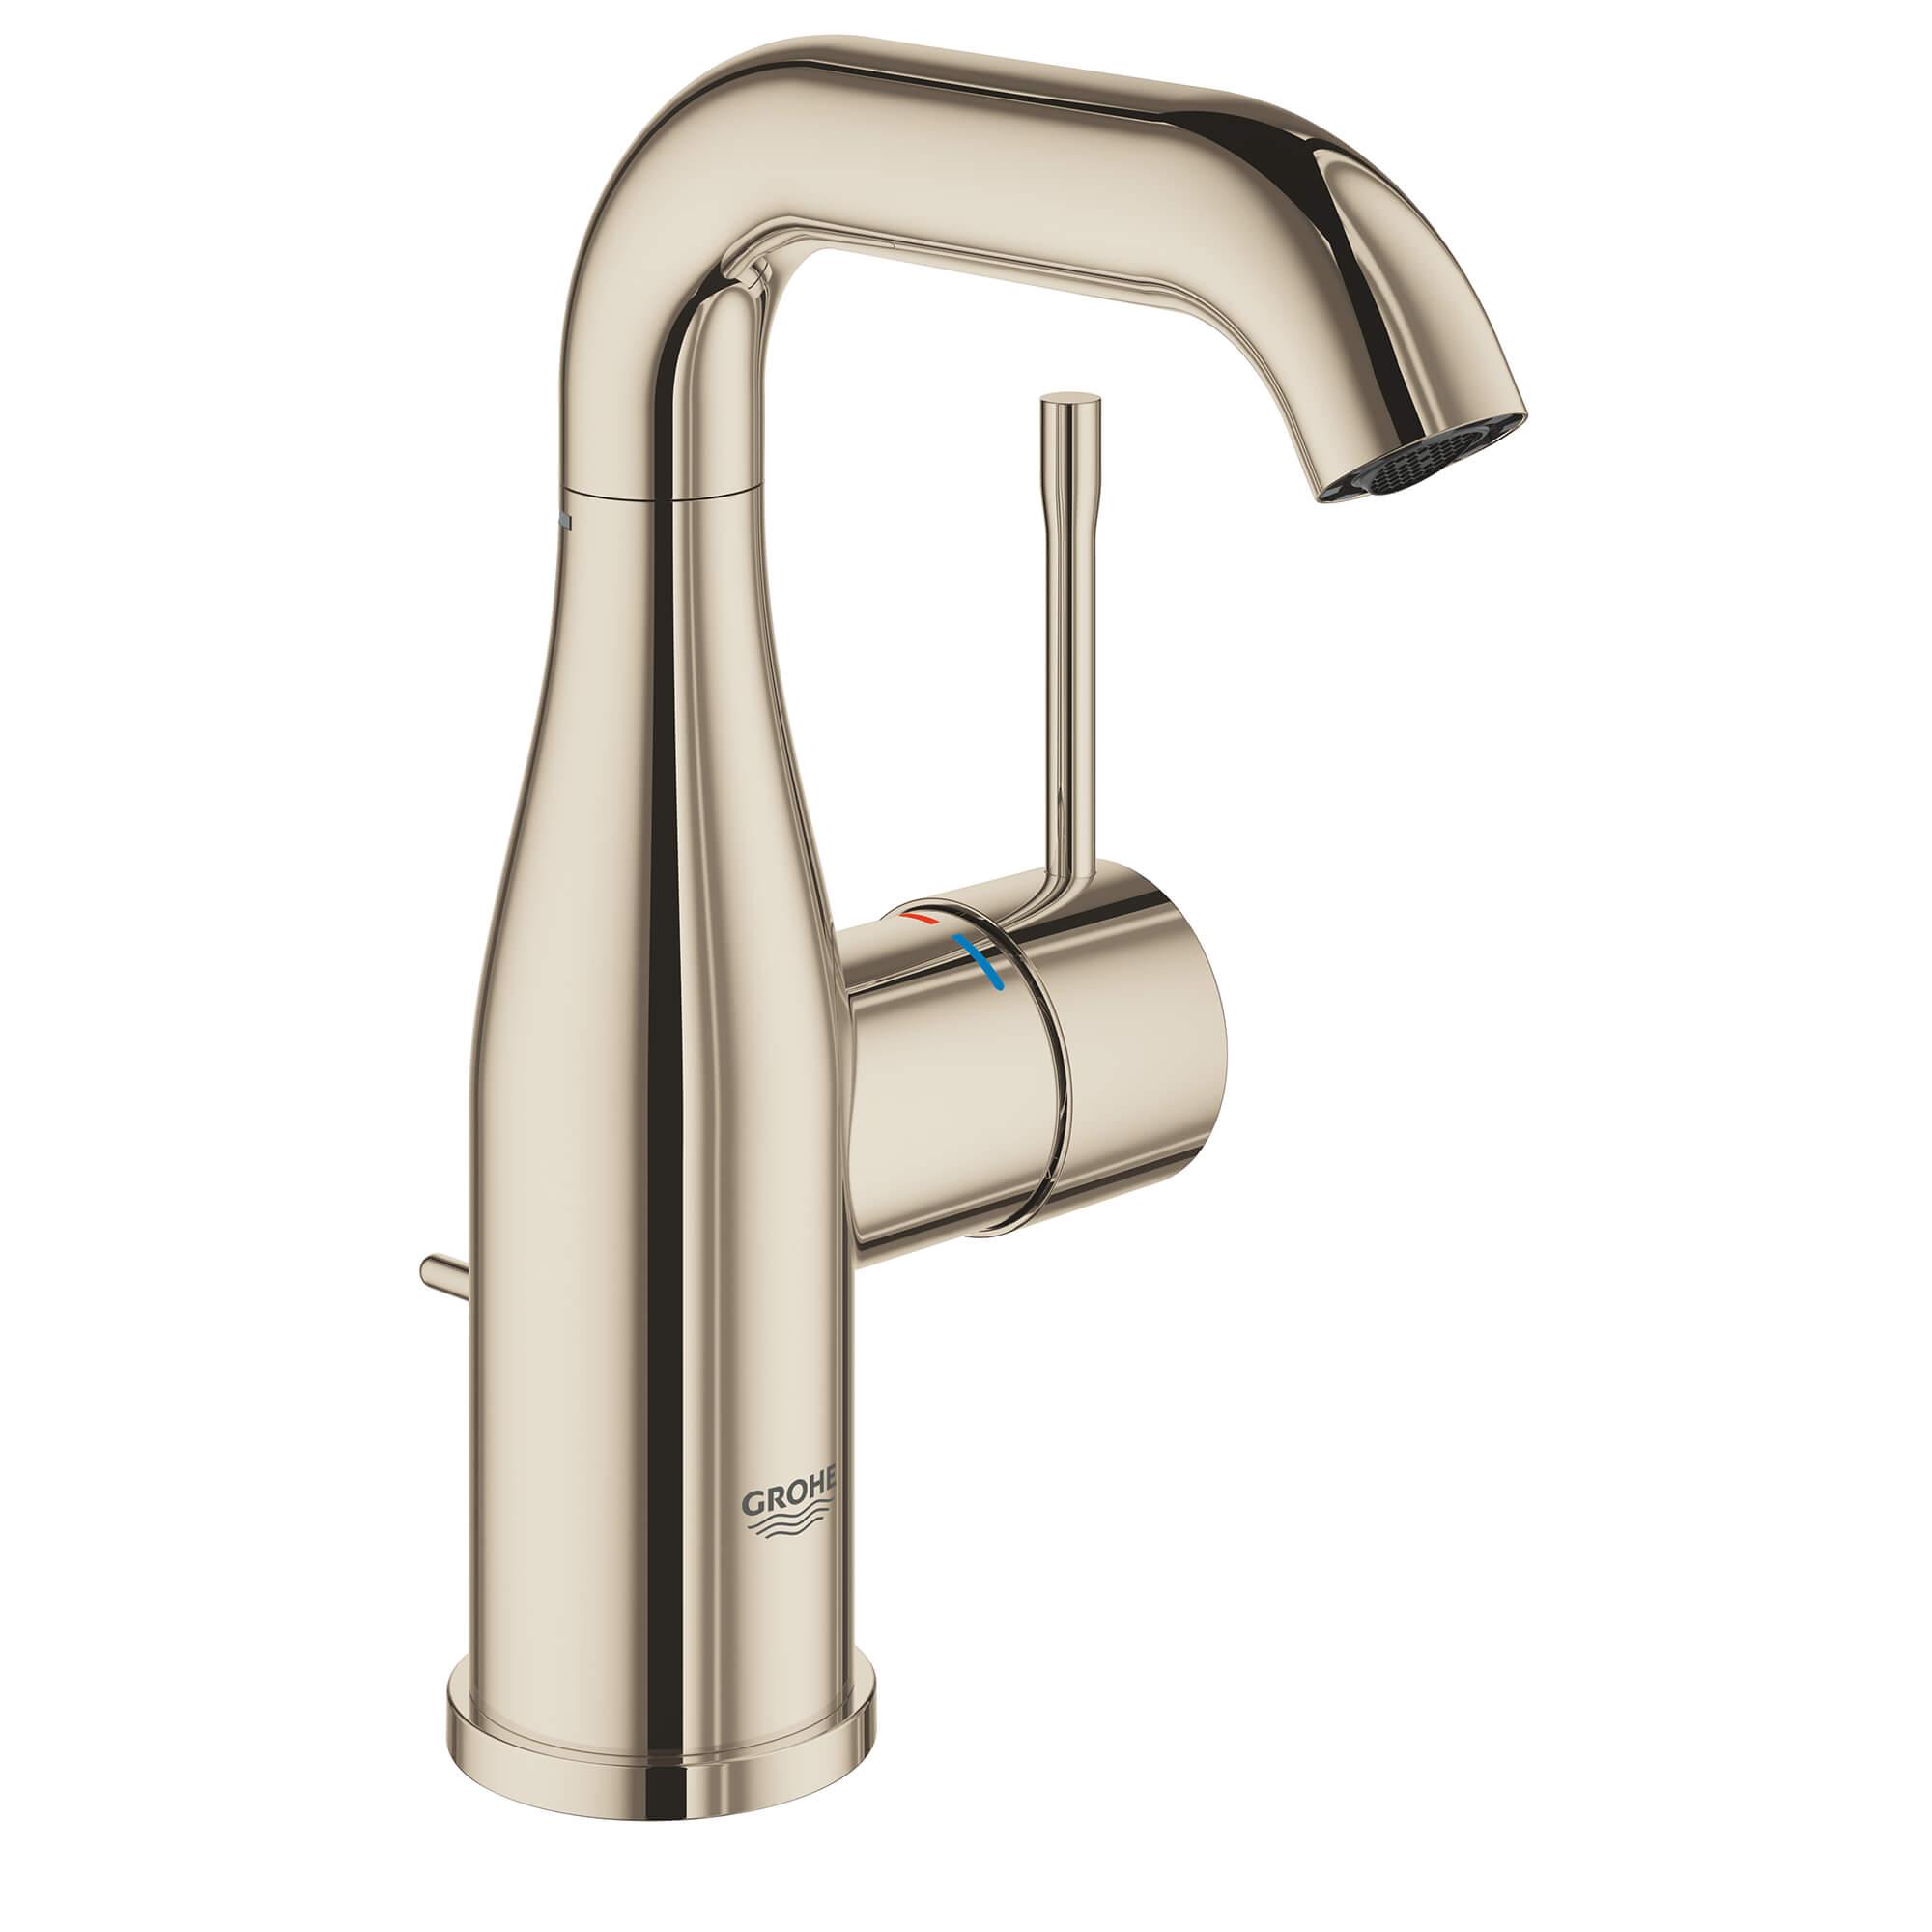 grohe 23485bea single hole single handle m size bathroom faucet 4 5 l min 1 2 gpm